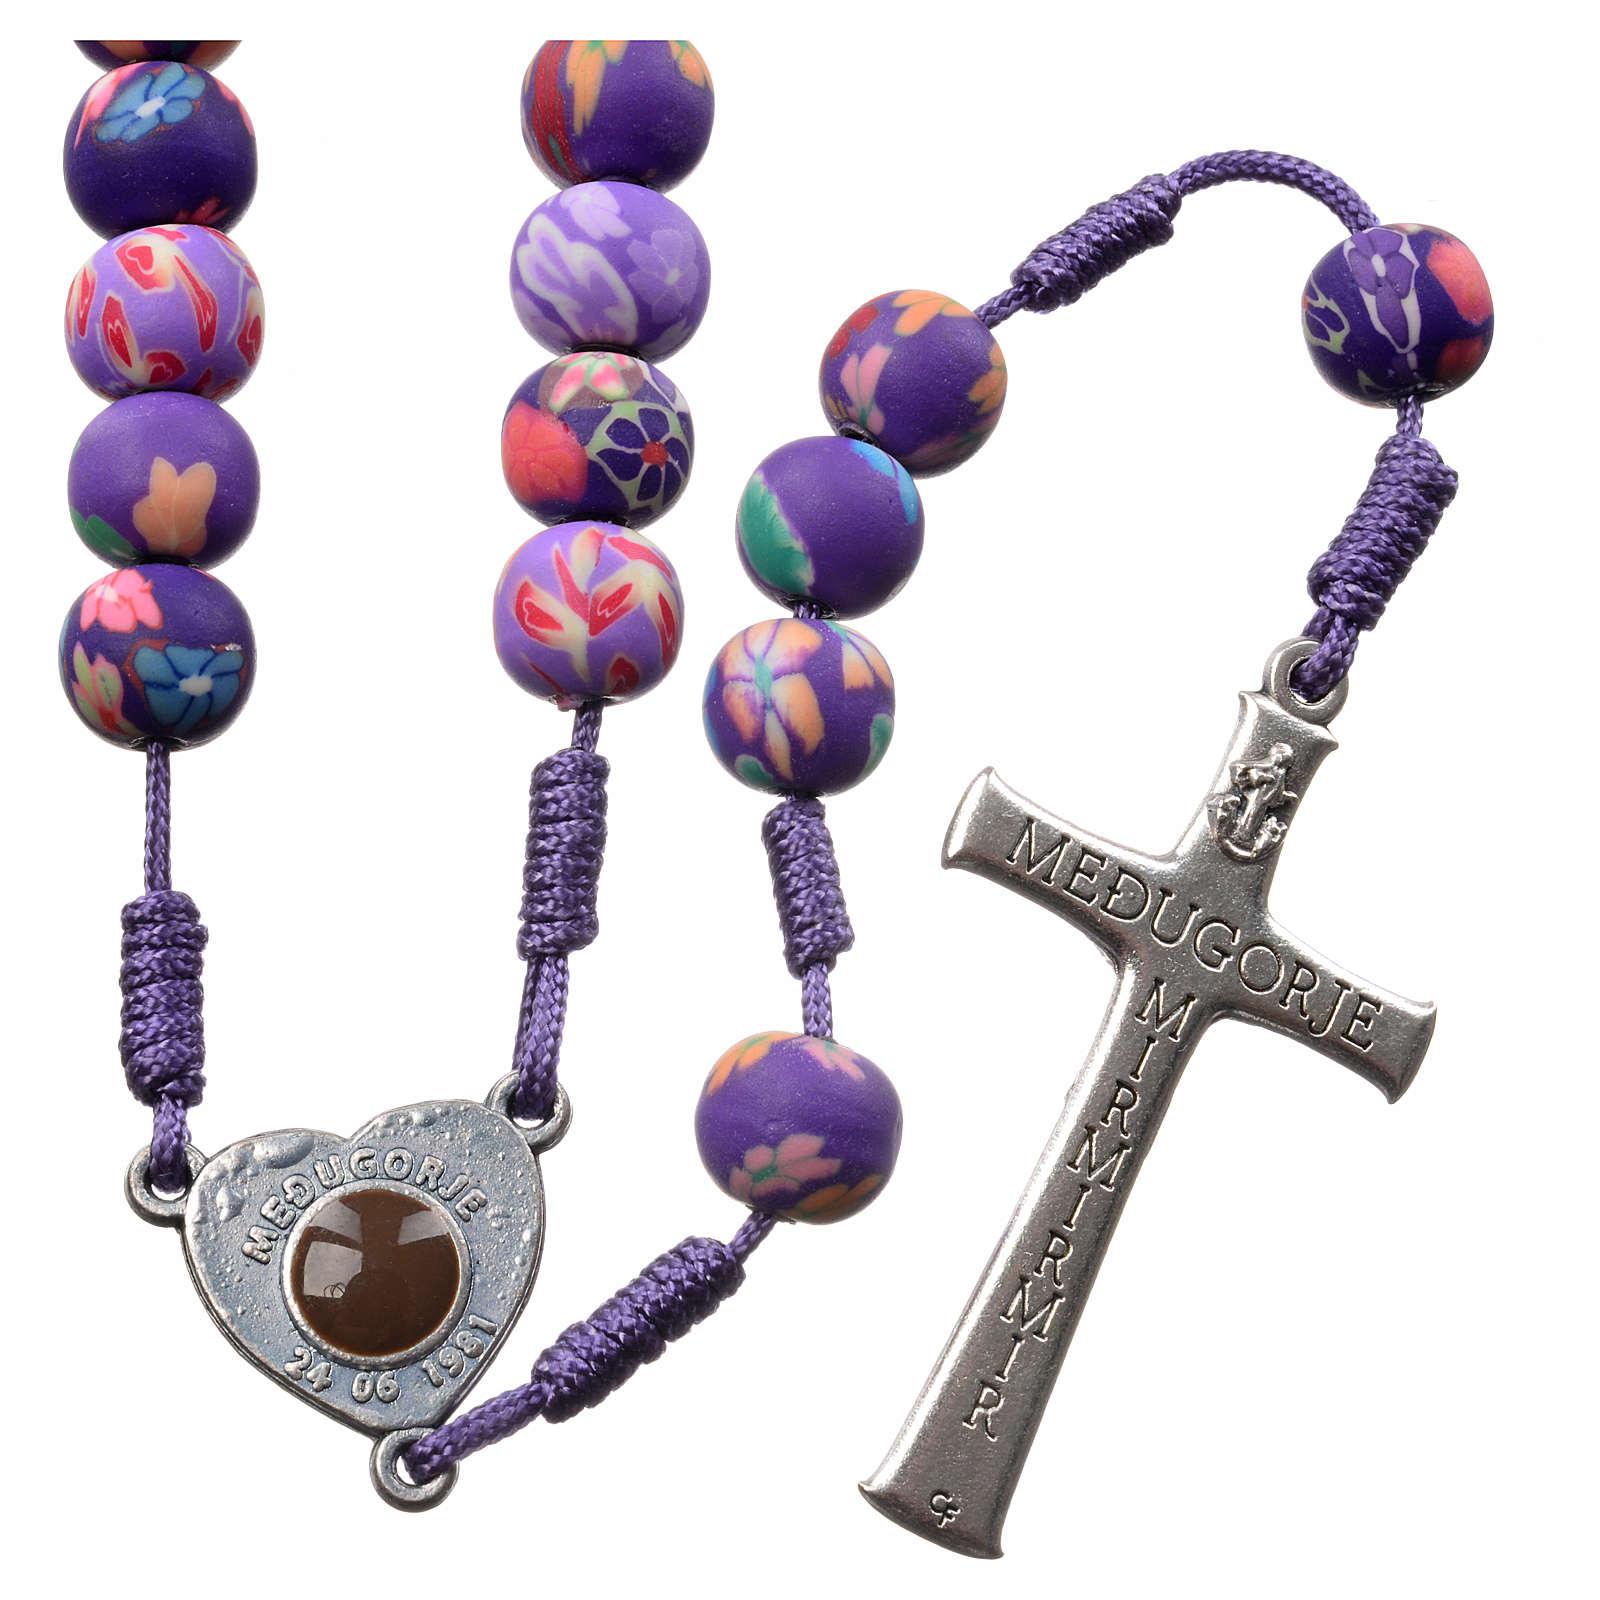 Medjugorje rosary in purple floral fimo with Medjugorje soil 4